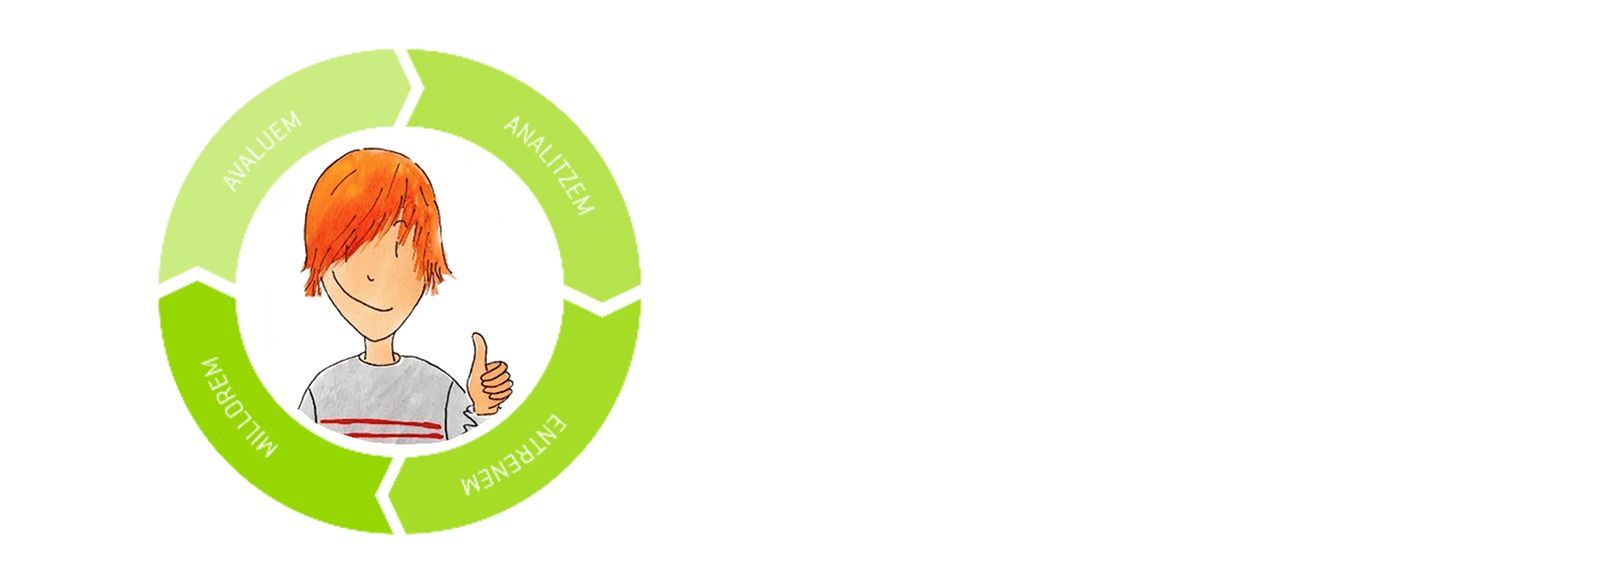 Método Glifing: Especialidades de Centre de Logopèdia i Psicologia Encaix